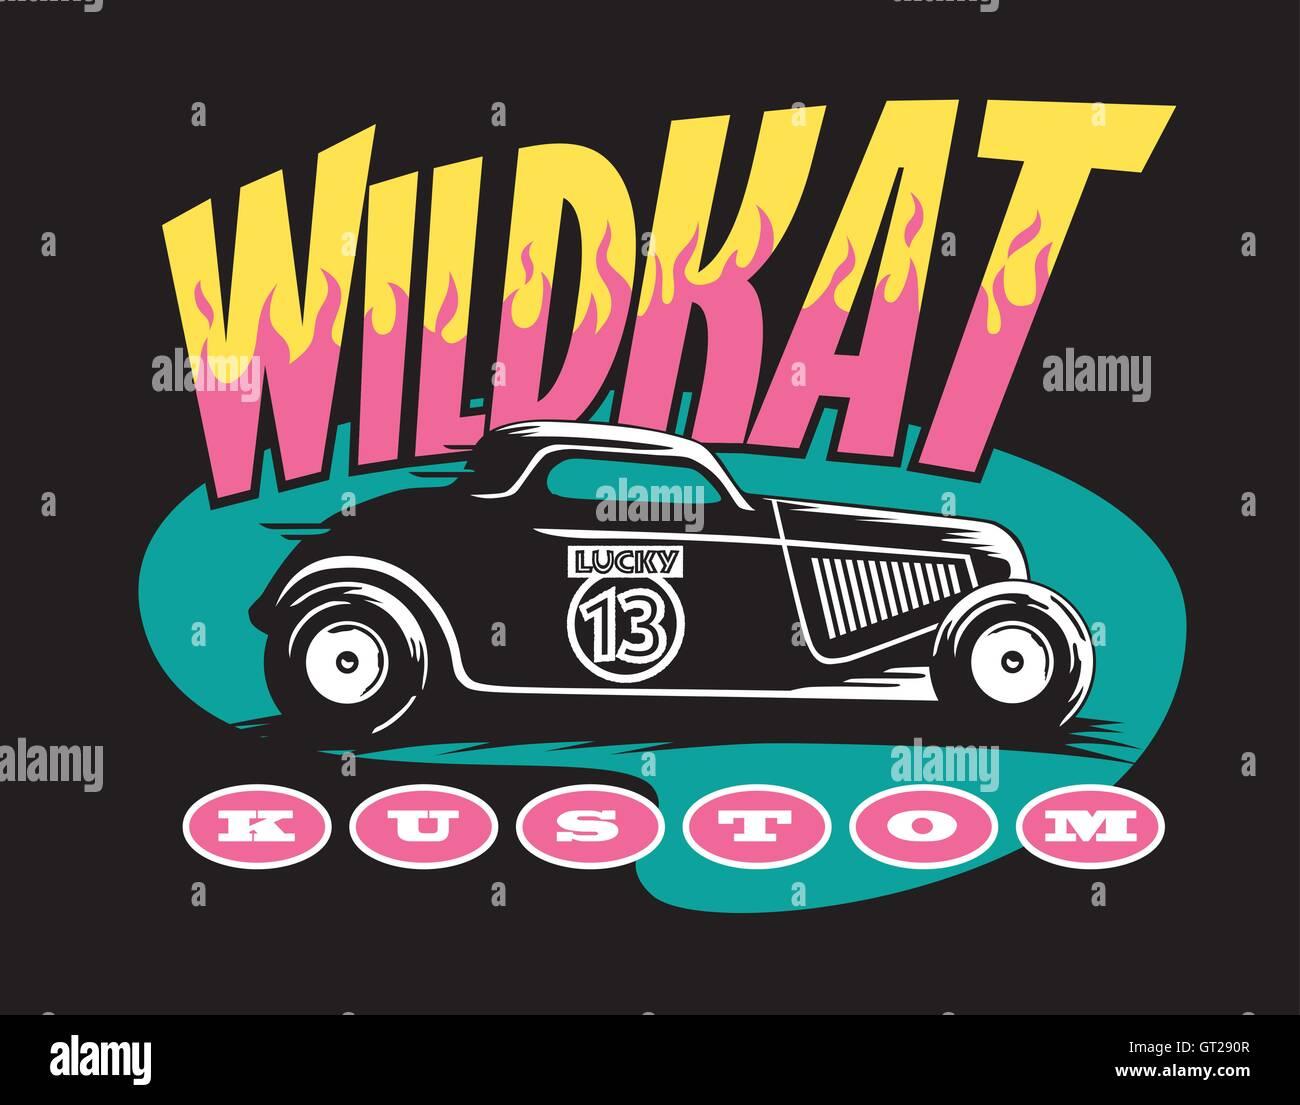 Wildkat Kustom hot rod design. Cool retro logo with old school ...